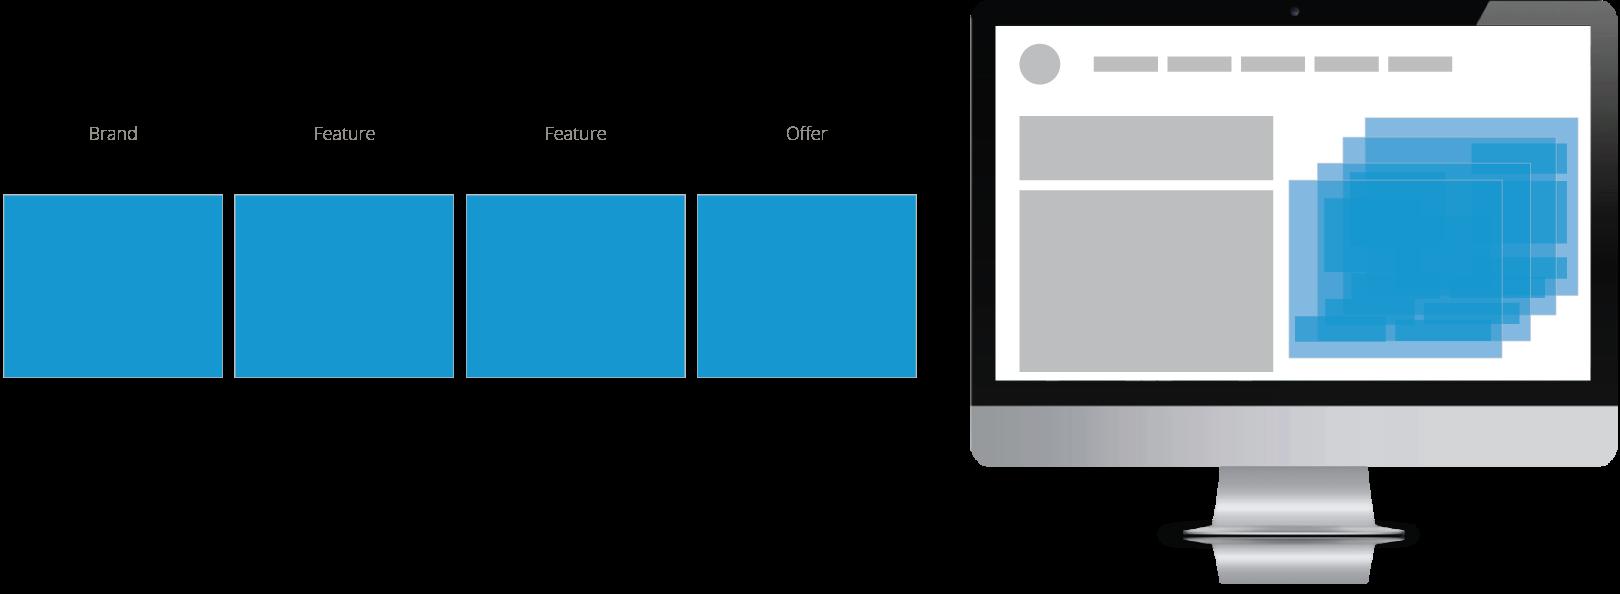 Motorola Template Examples